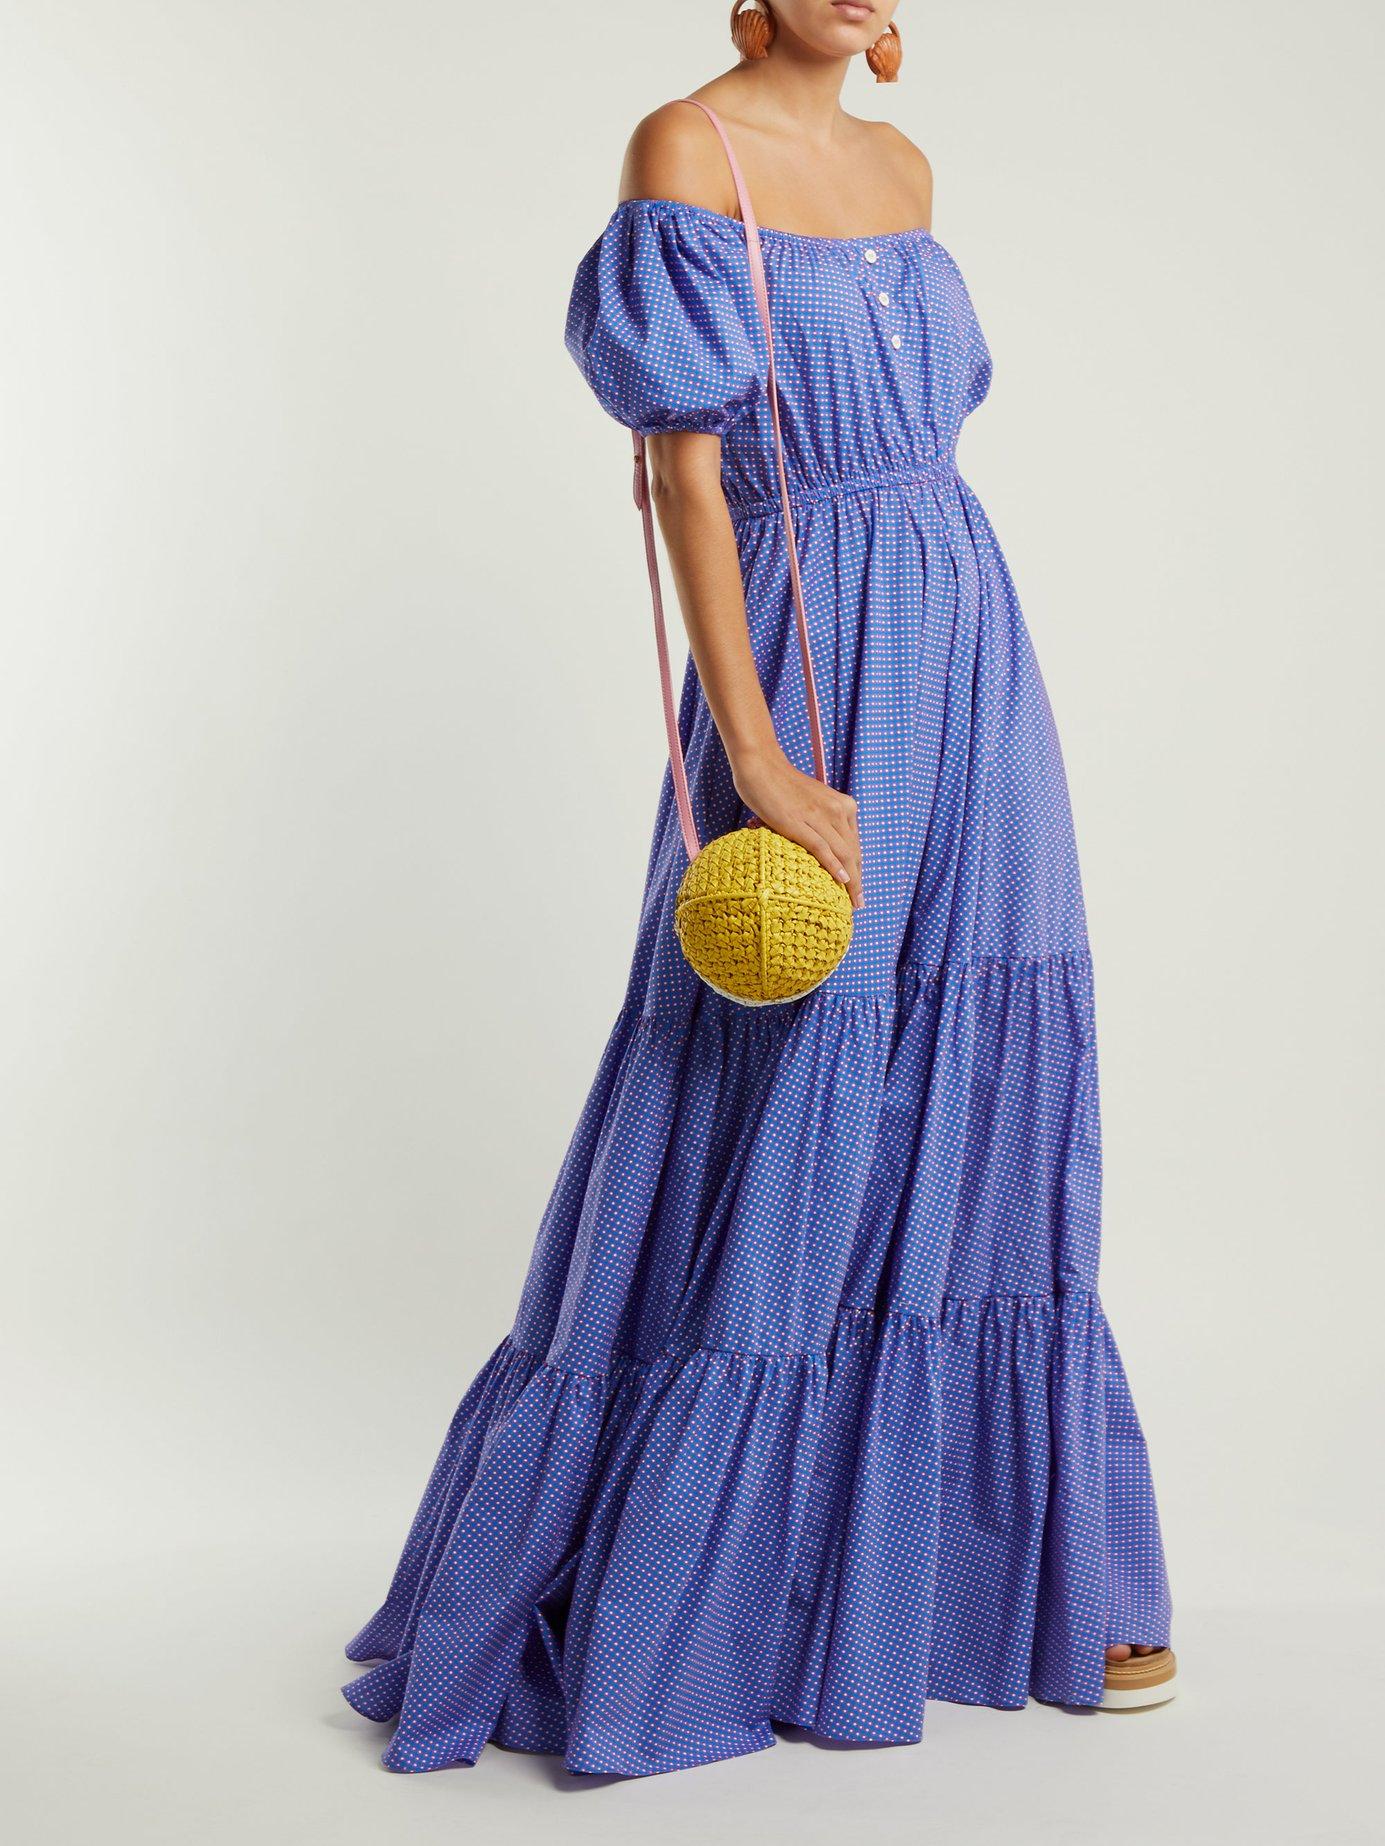 Bardot off-the-shoulder geometric-print maxi dress by Caroline Constas